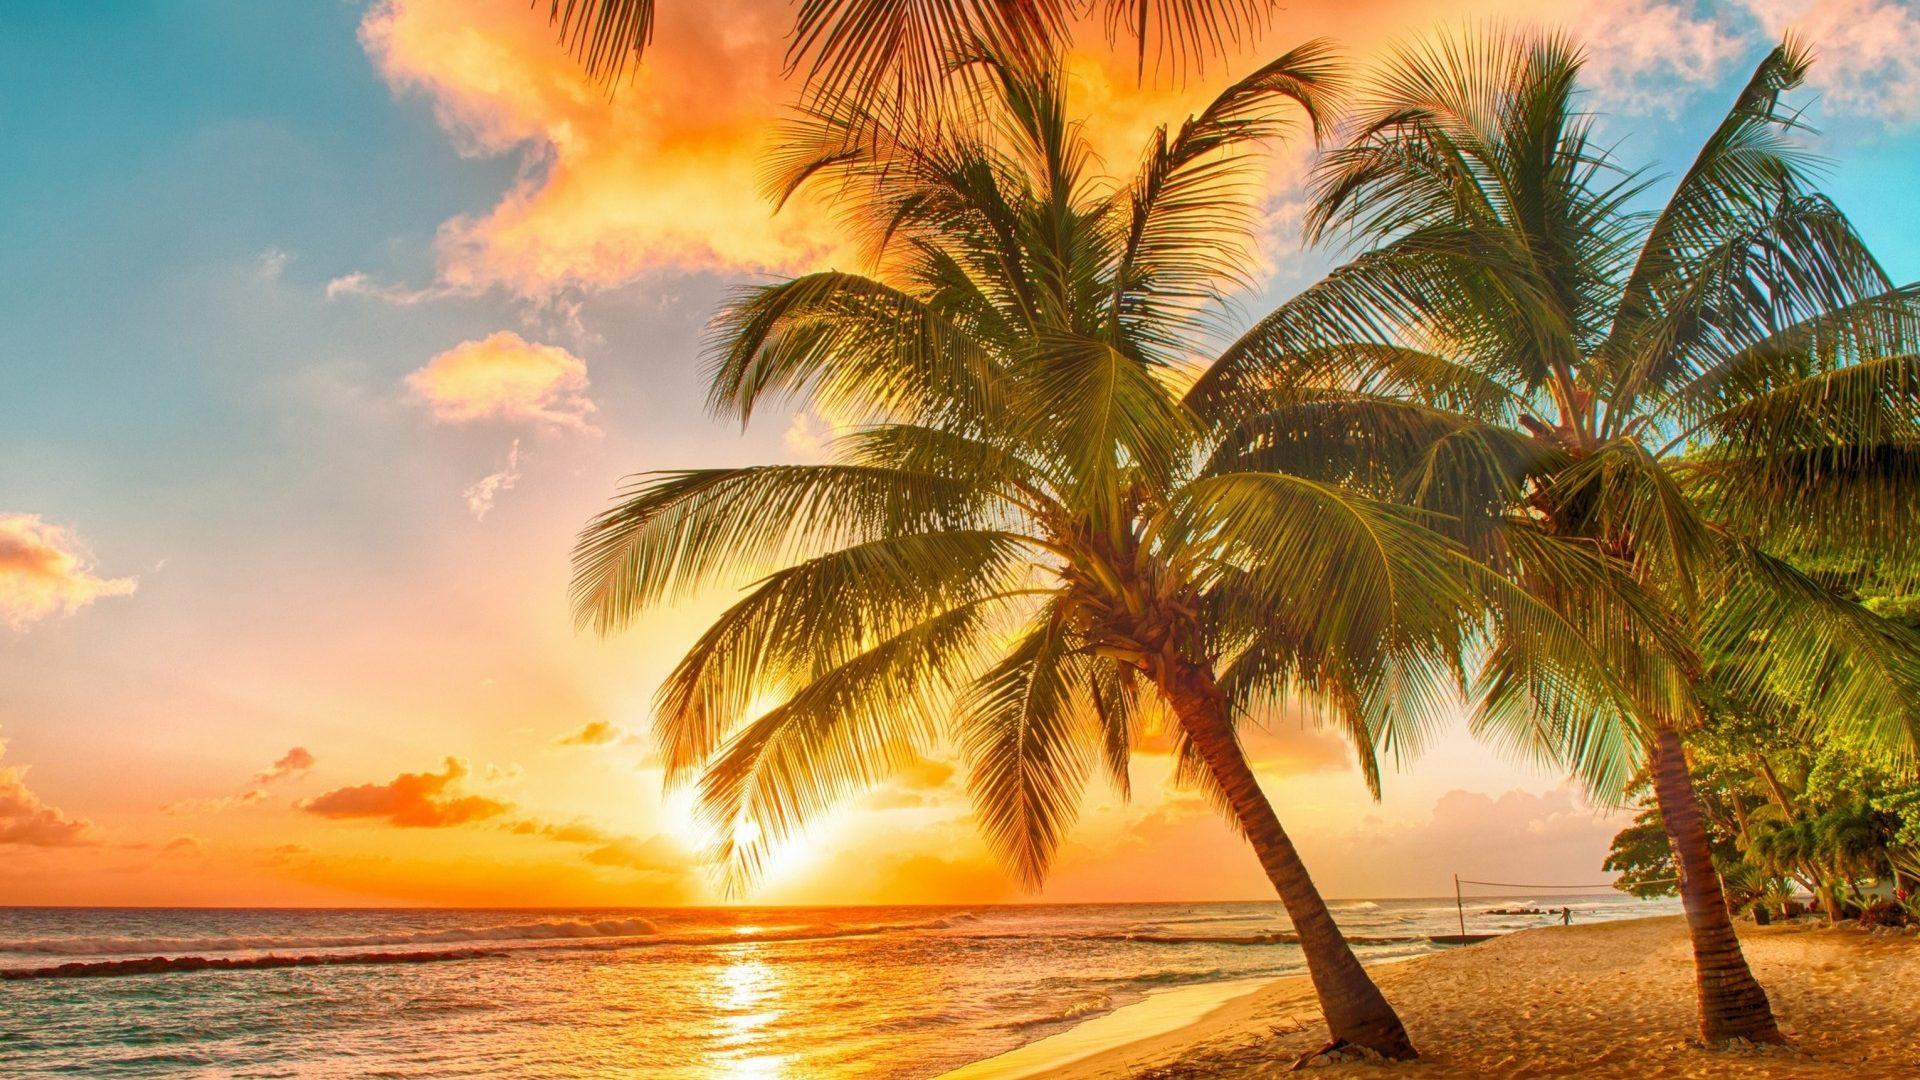 Mostnature tropical sunset palms paradise beach sea hd mostnature tropical sunset palms paradise beach sea hd wallpapers 1080p voltagebd Choice Image